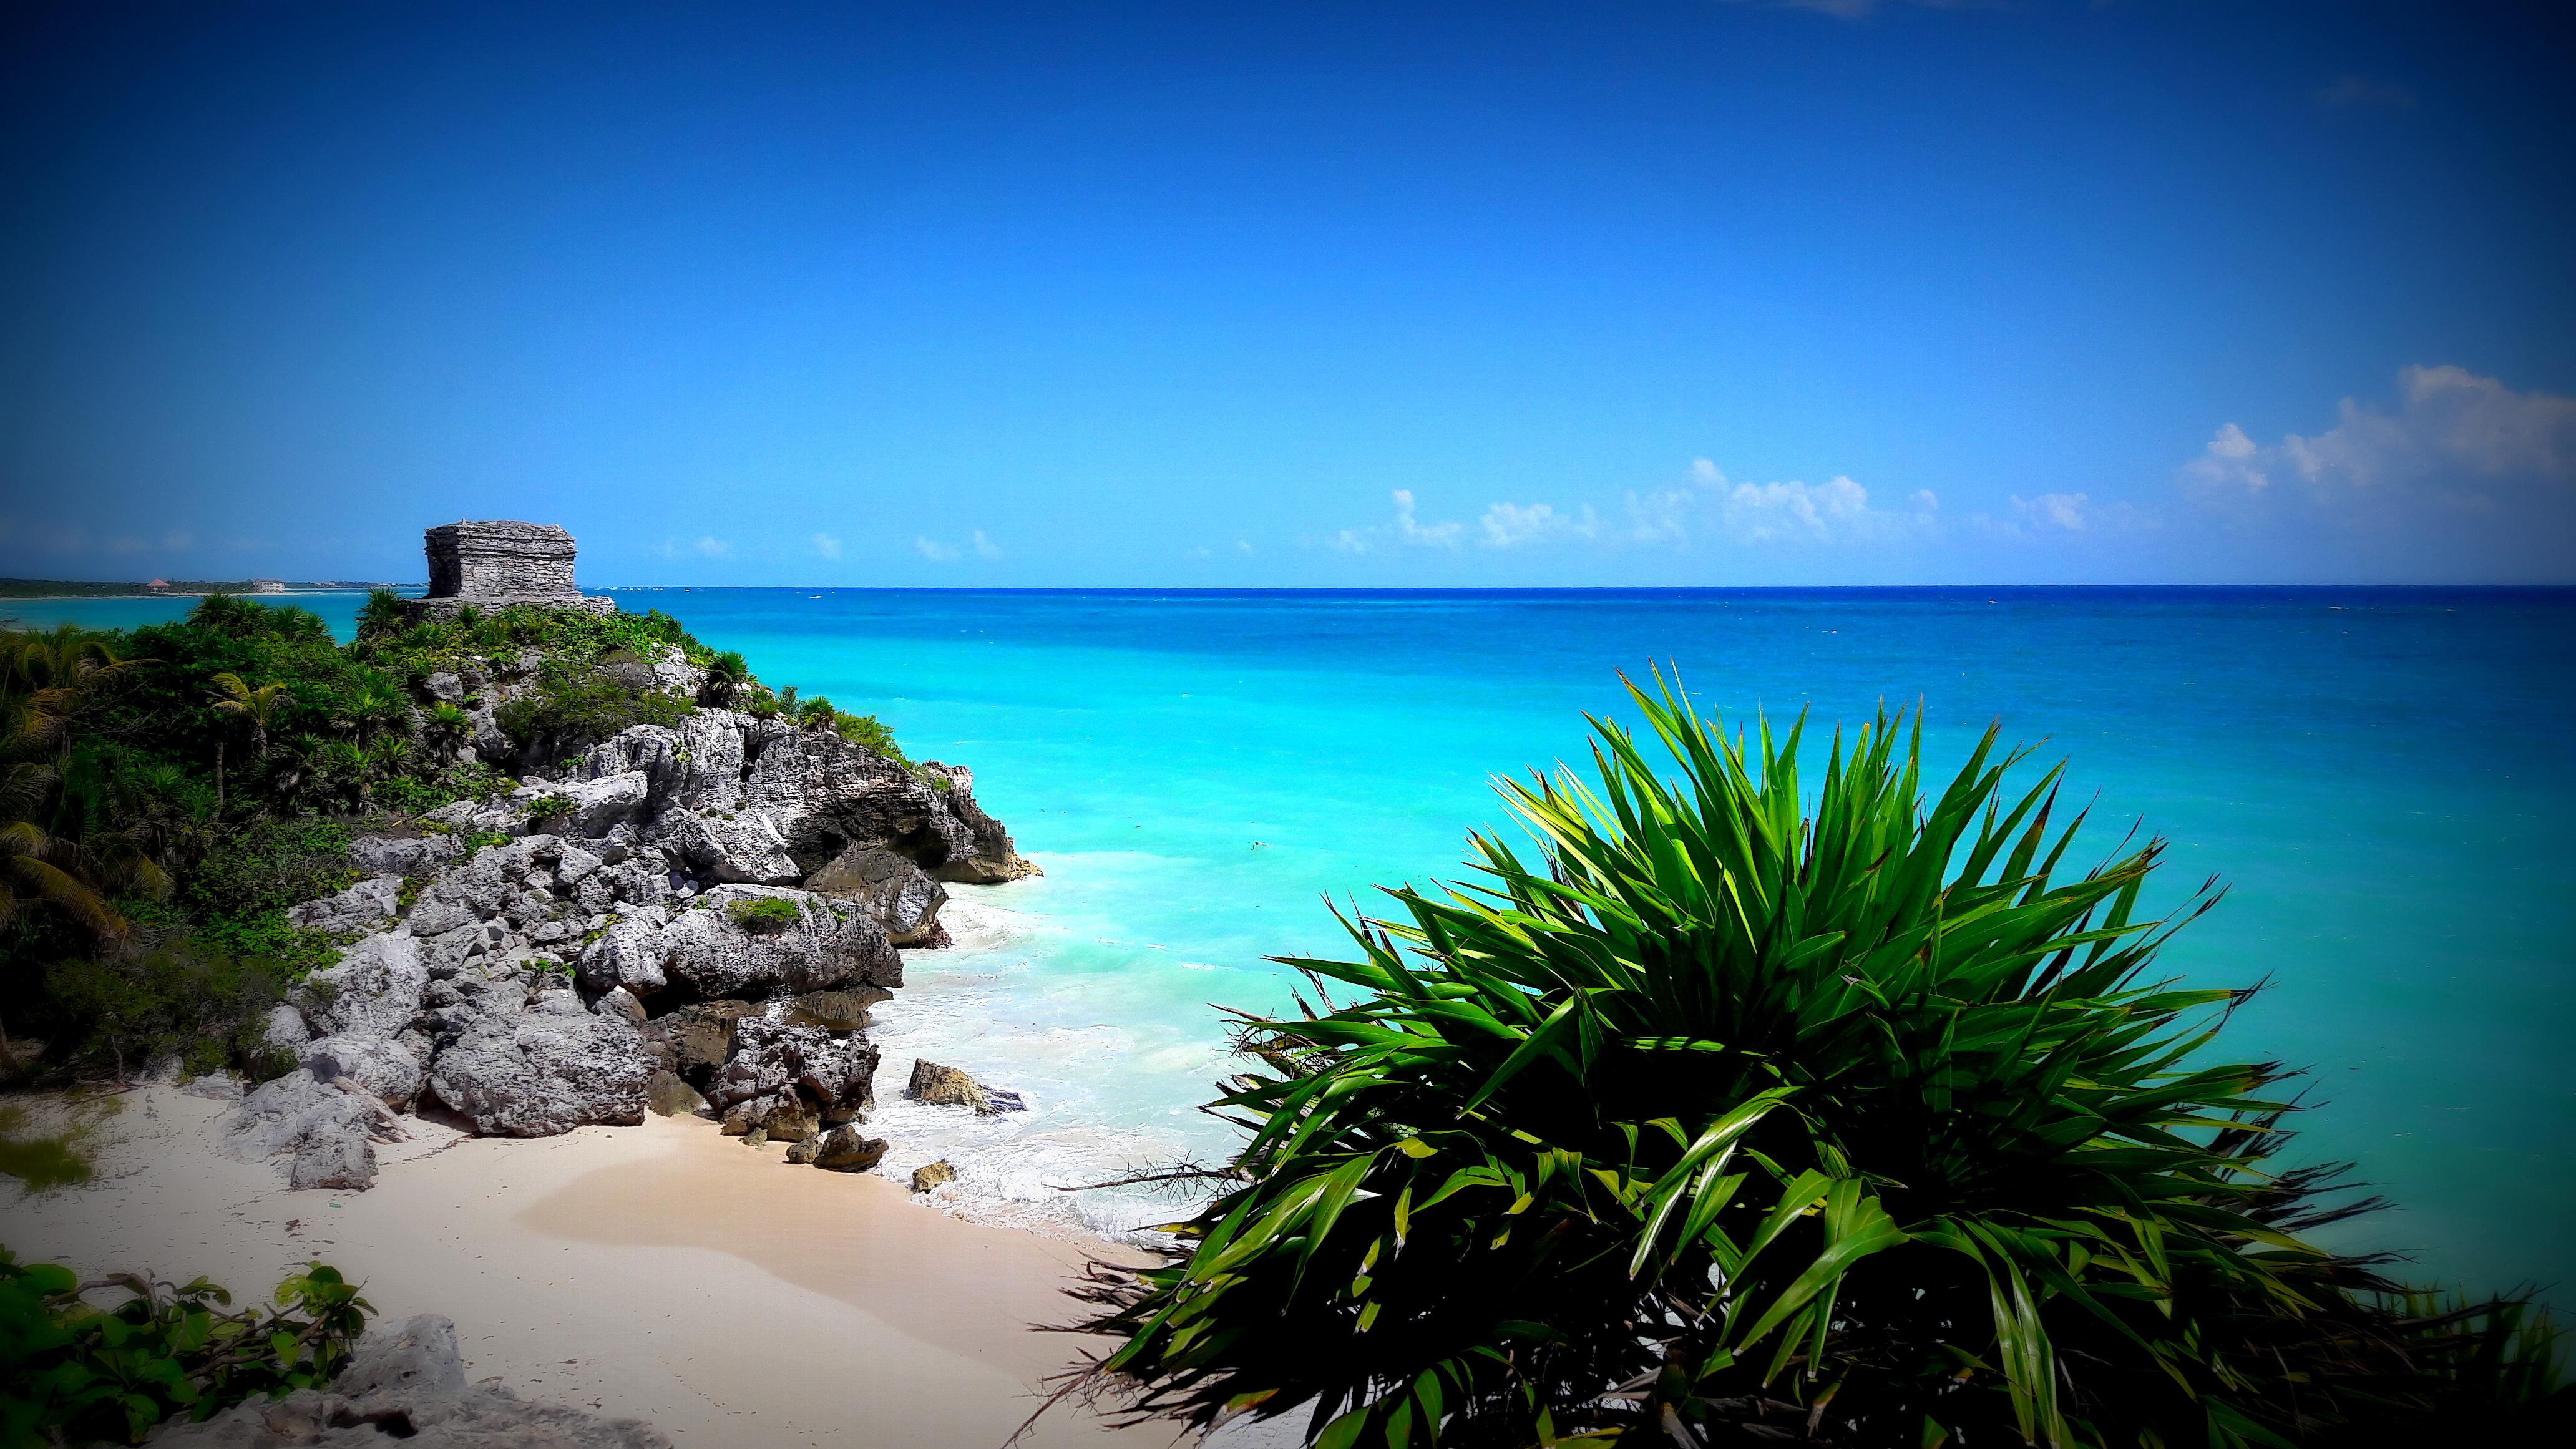 Mexican beach caribbean sea archeological mayan 1458205 pxhere